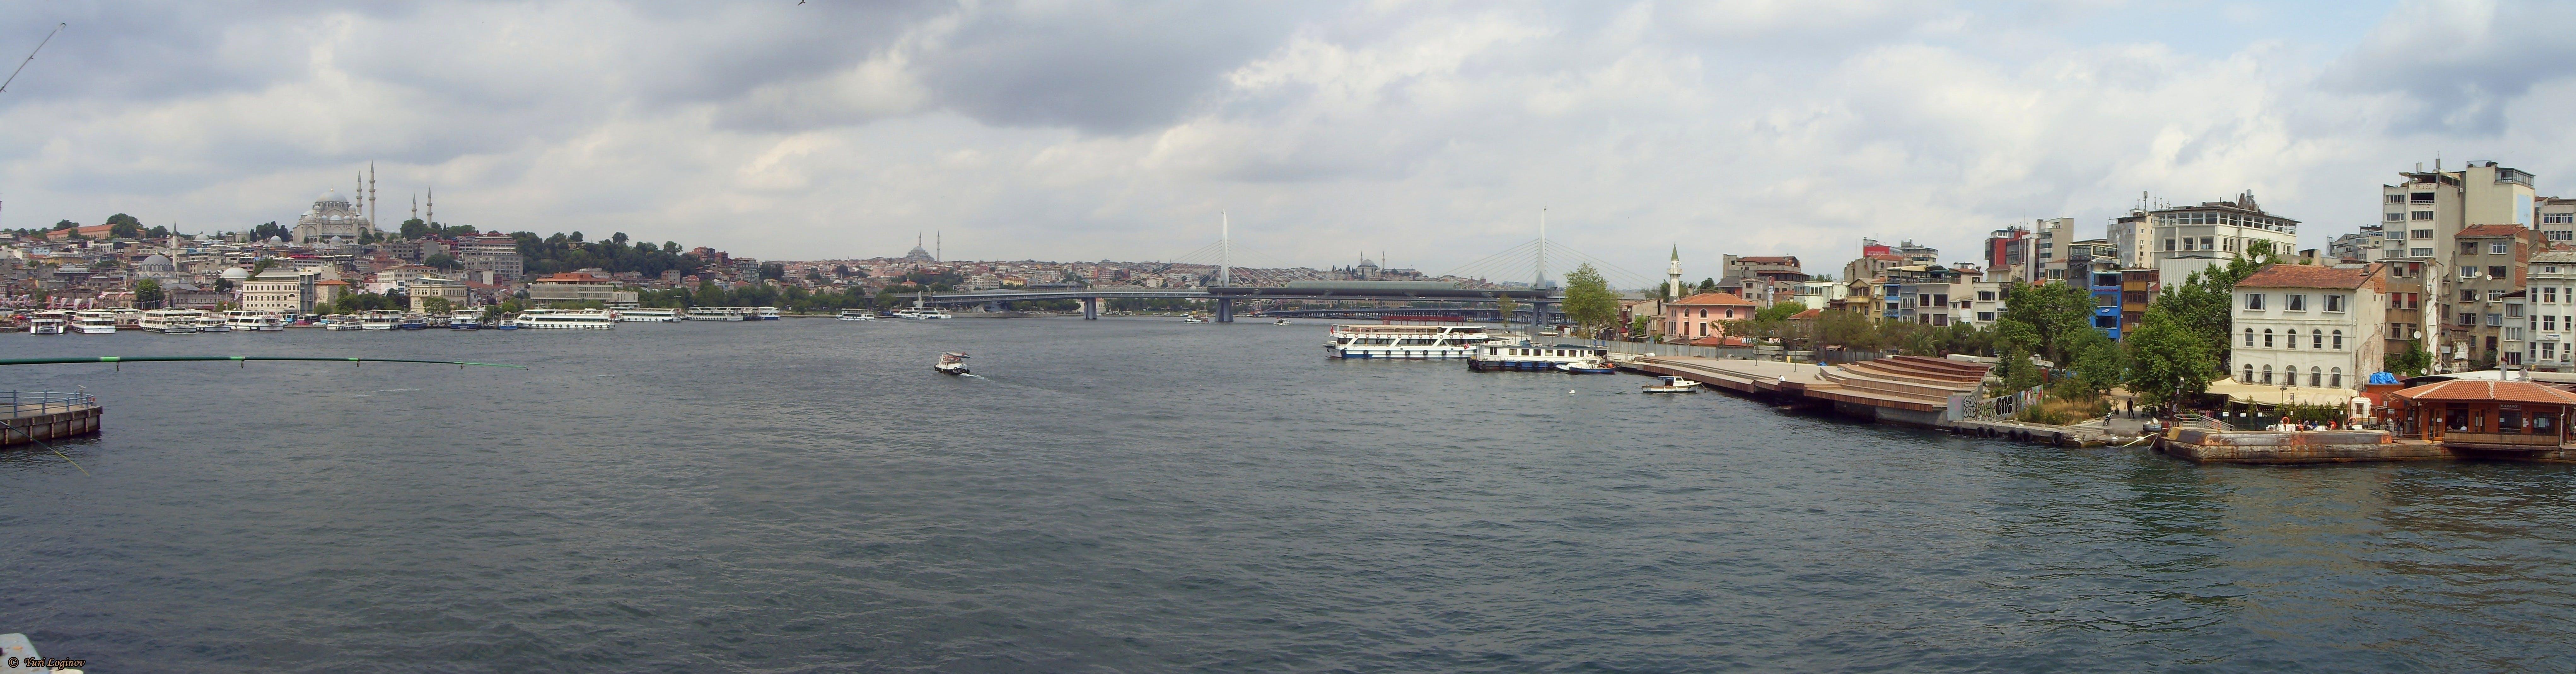 Free stock photo of turkey, Istanbul, TÜRKİYE, golden horn